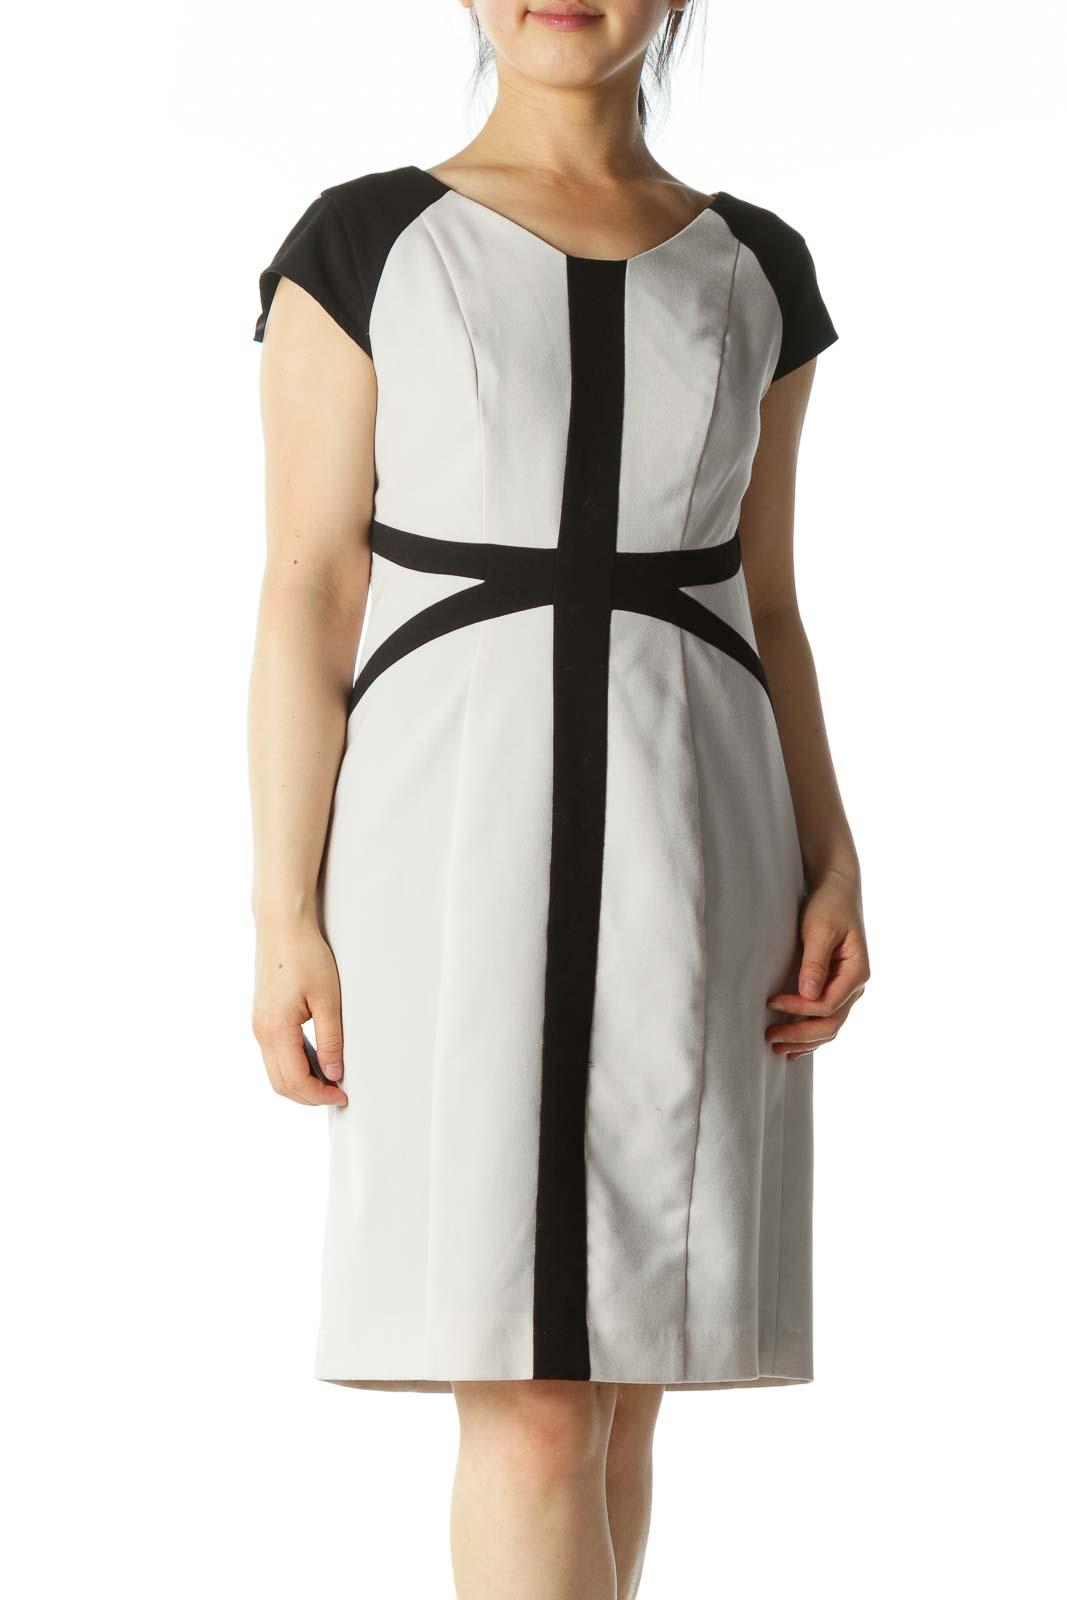 Gray Black Geometric Design Fitted Work Dress